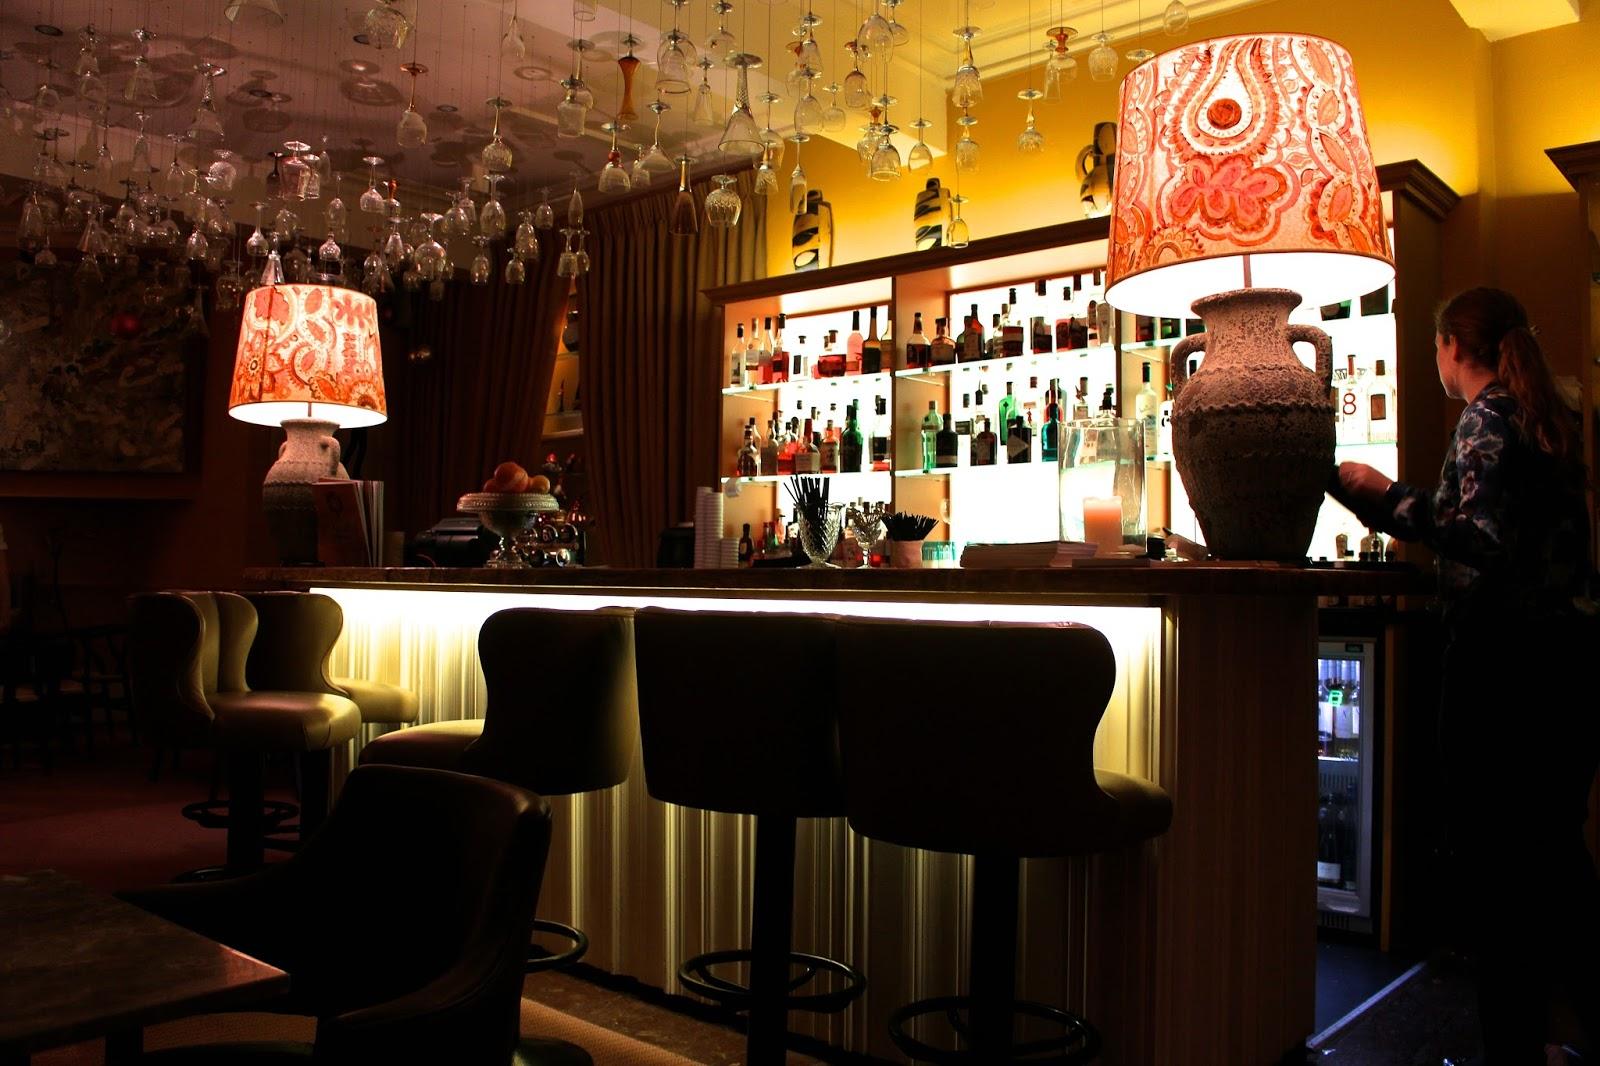 abbey hotel art bar 2015